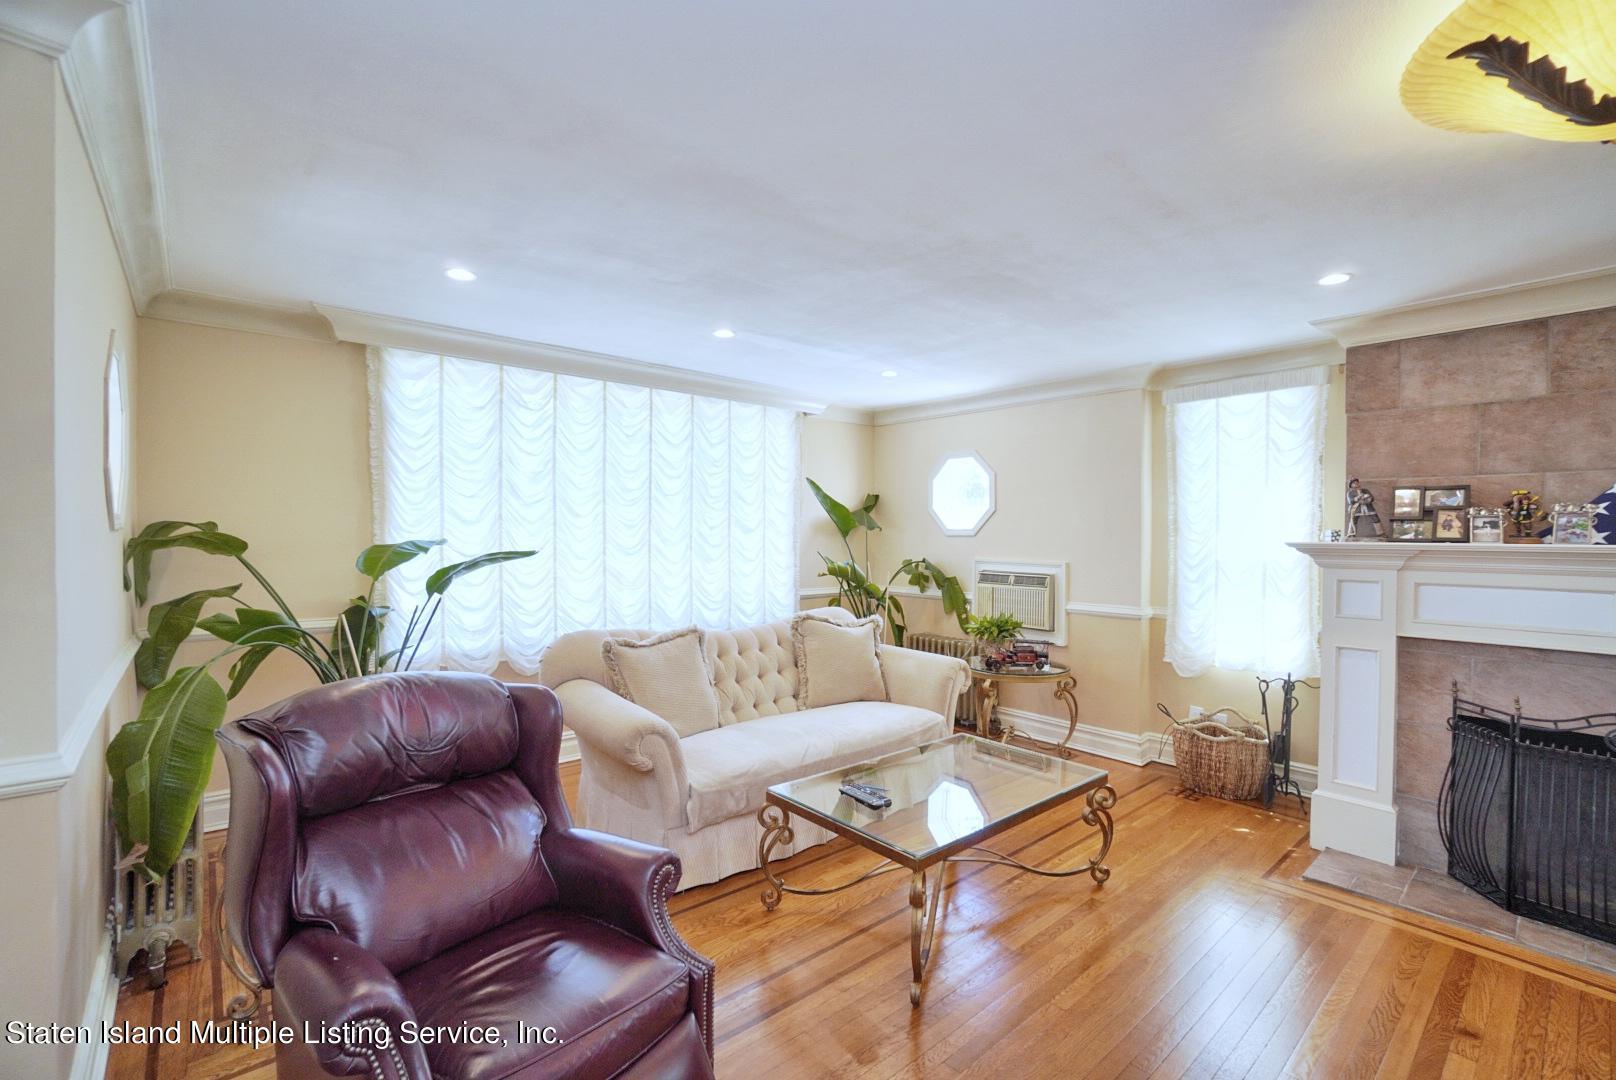 Single Family - Detached 264 Fisher Avenue  Staten Island, NY 10307, MLS-1146898-12